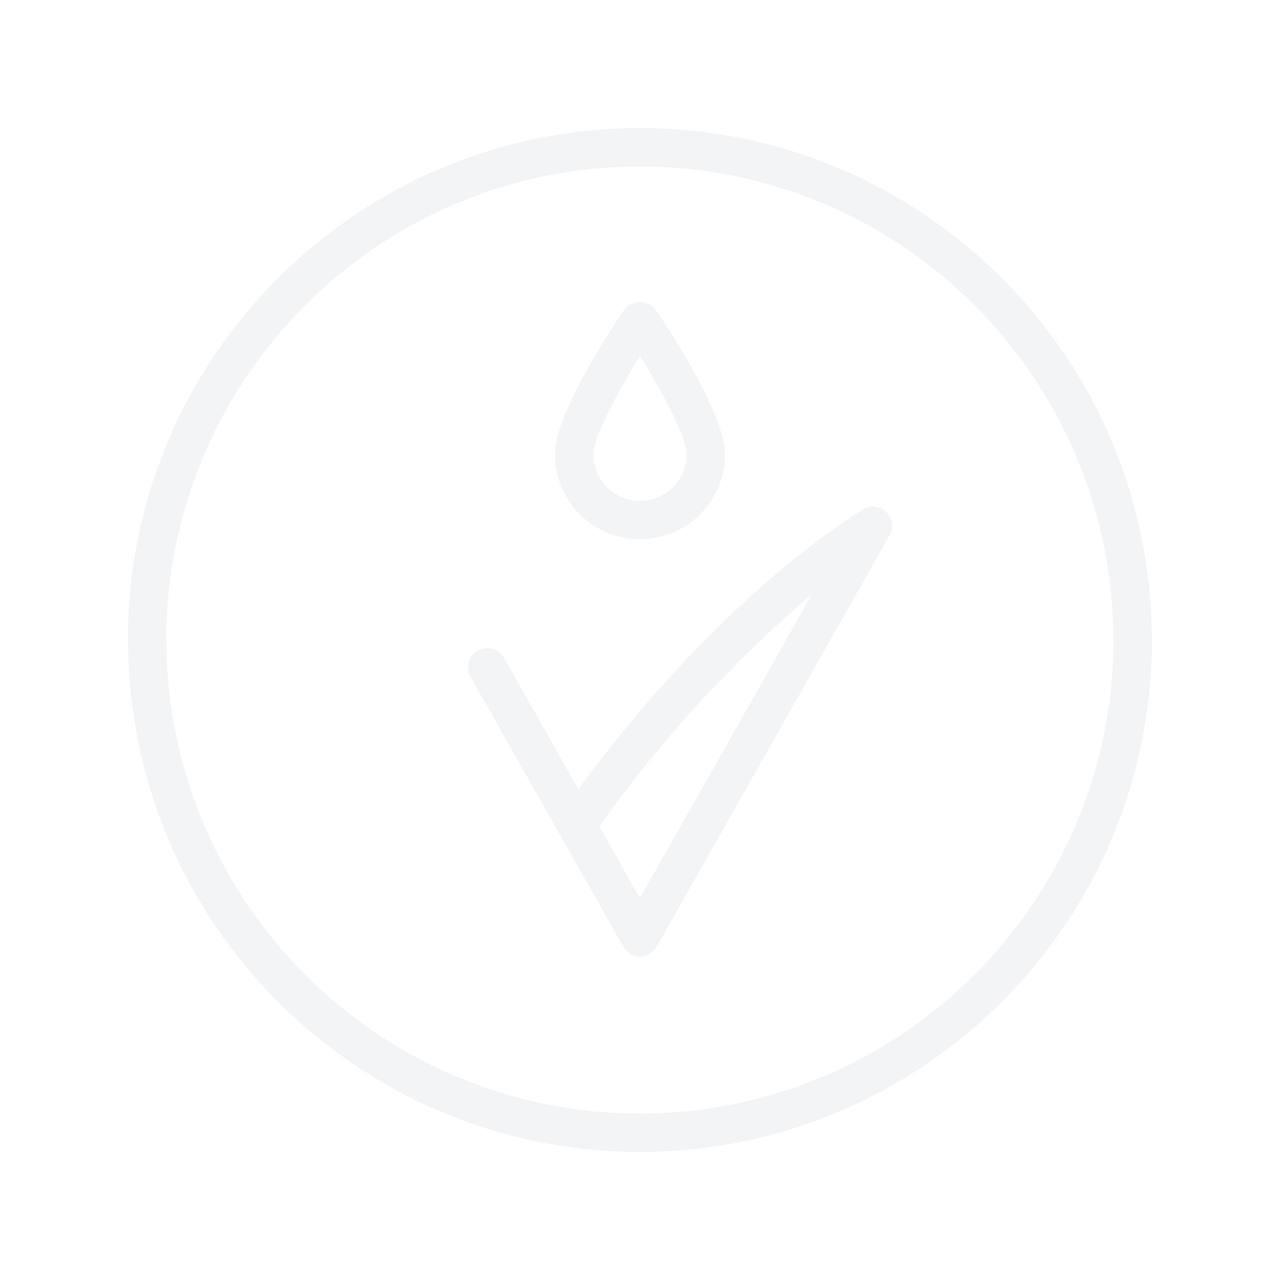 HOLIKA HOLIKA Dualizm Sheet Mask (Water & Oil) маска для сухой кожи